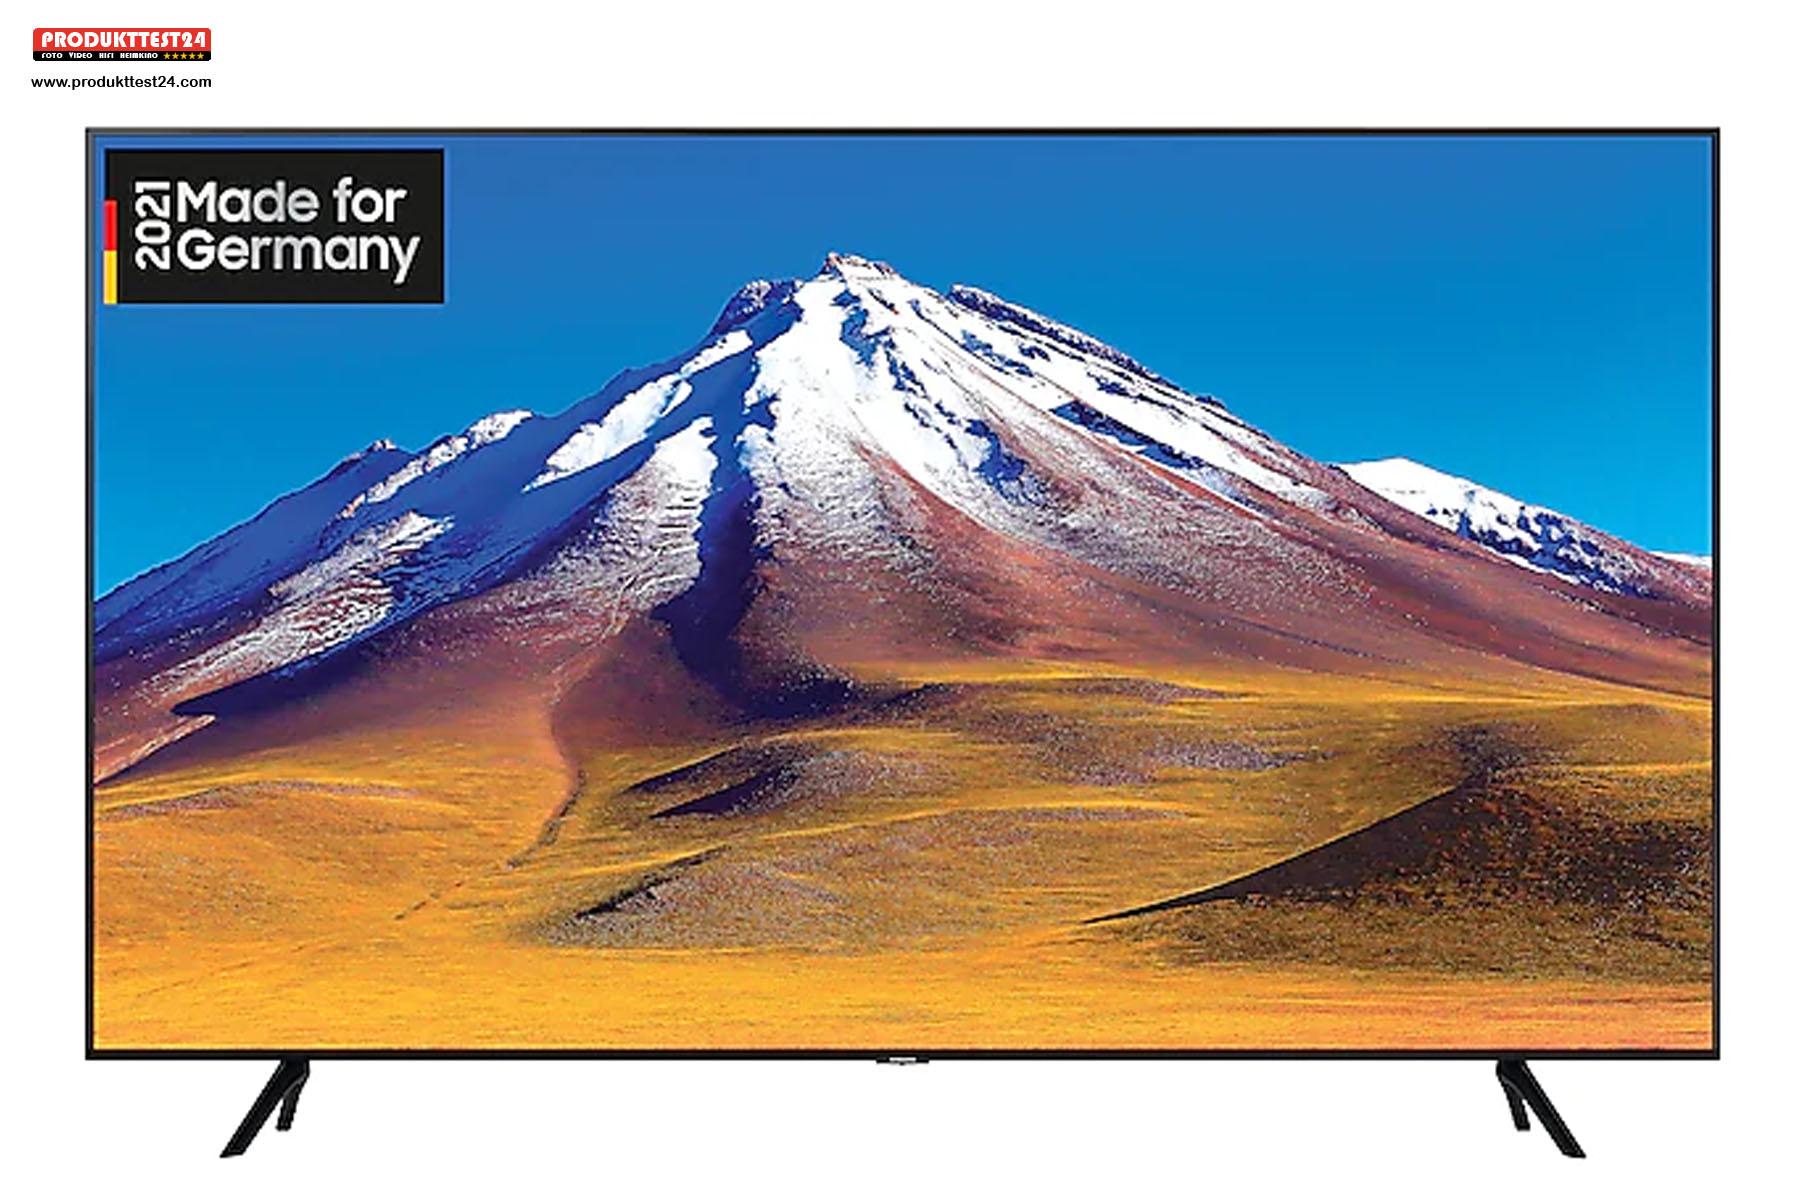 Samsung GU55TU6979 - 55 Zoll Bilddiagonale mit UHD Auflösung